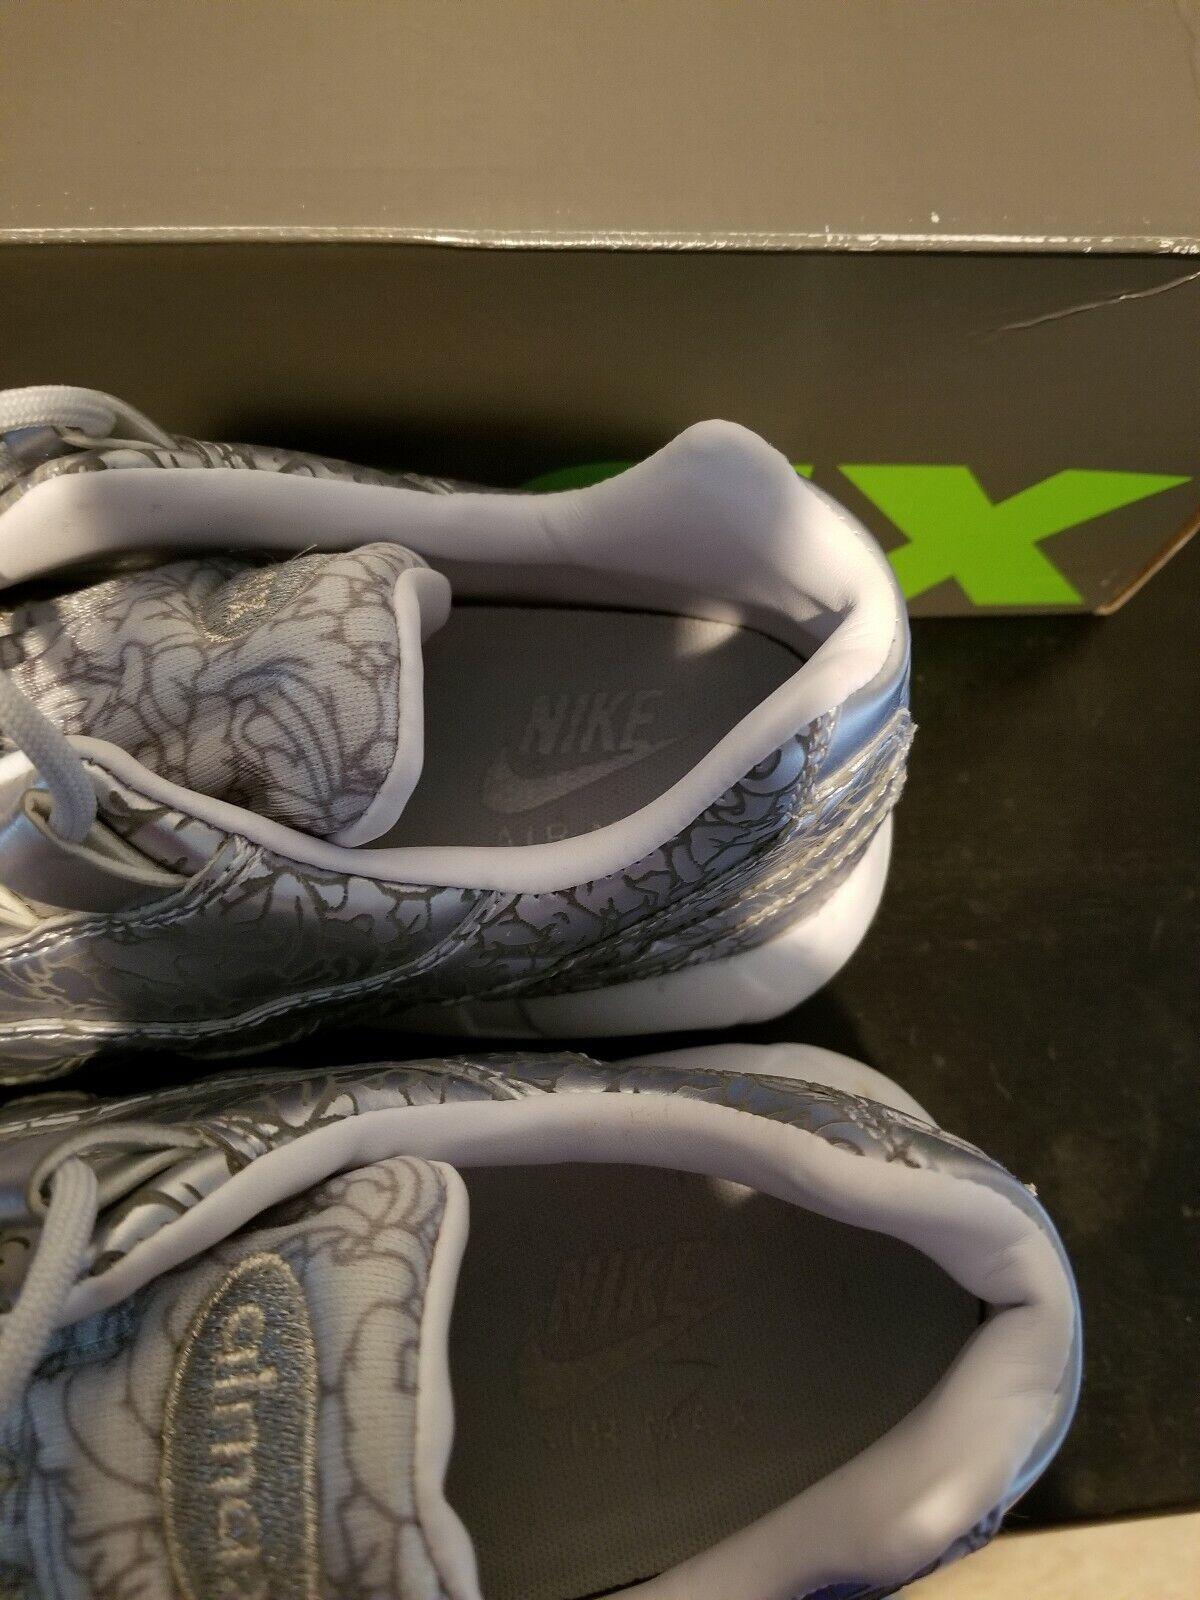 DS NIB Nike Air Max 95 95 95 20th Anniversary QS Uomo US Dimensione 9.0 818721-001 a4c1ad